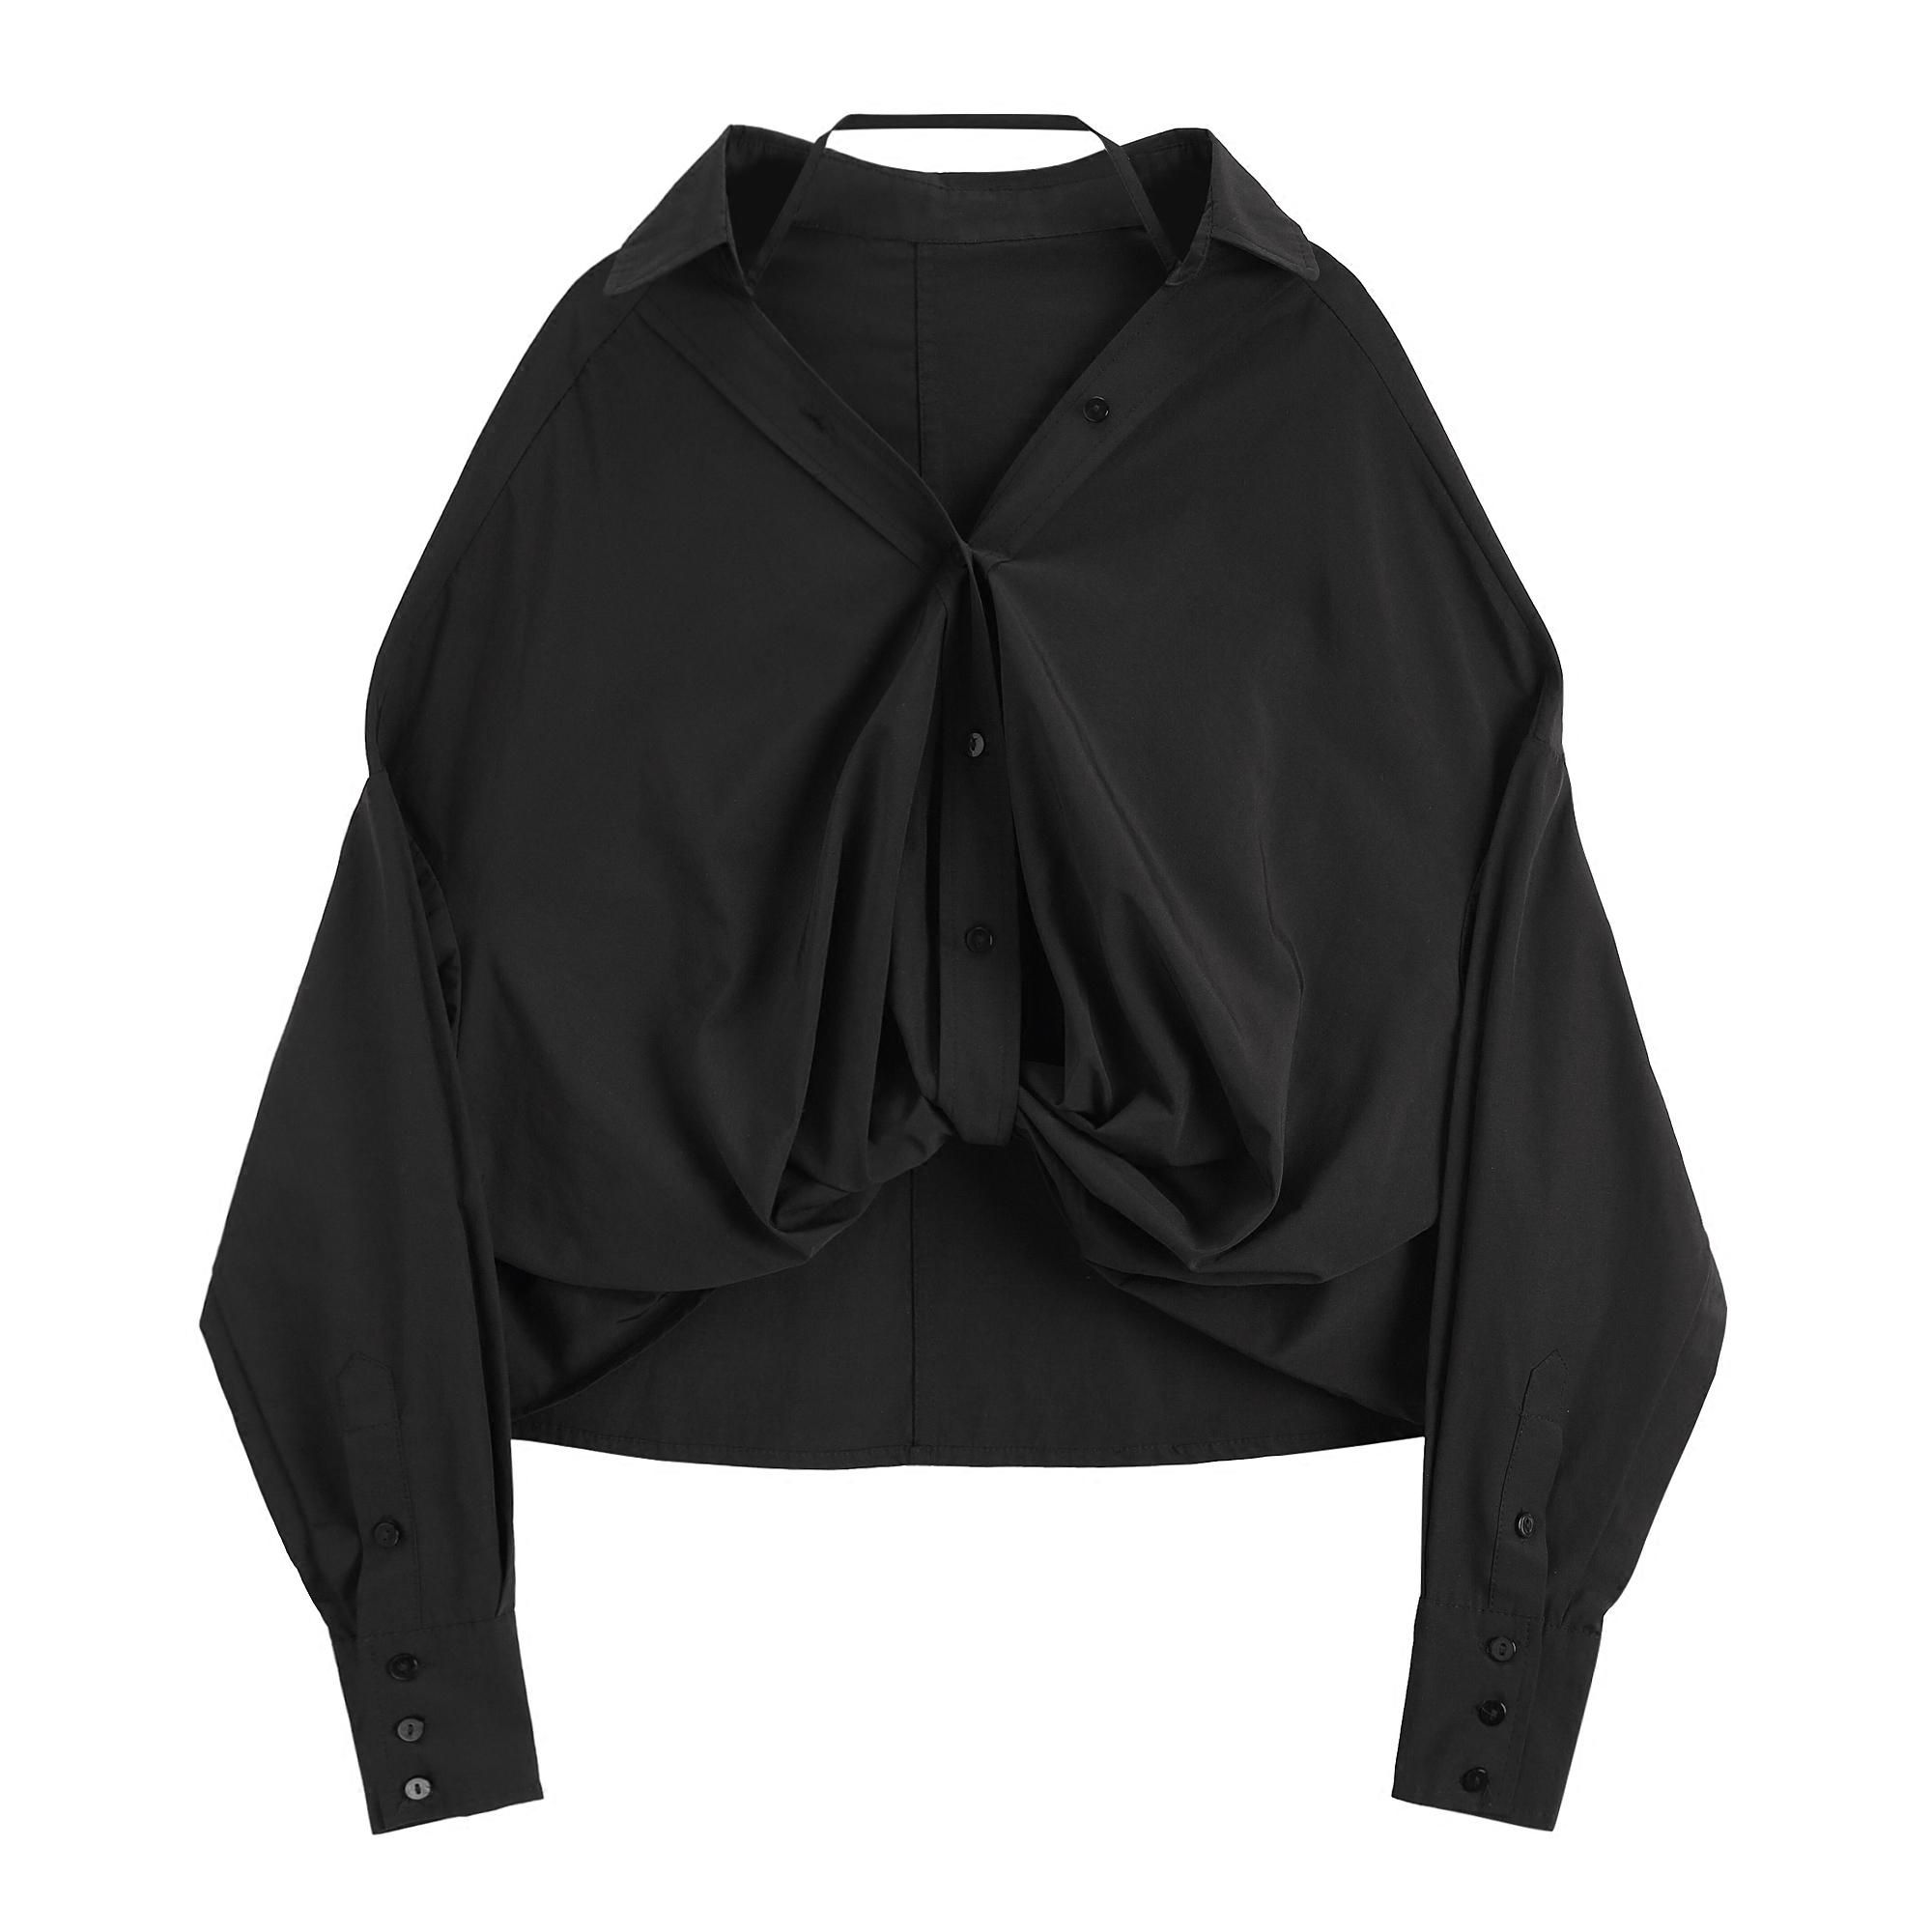 Designer club 秋装上衣女2018新款自制长袖前短后长V领宽松衬衫